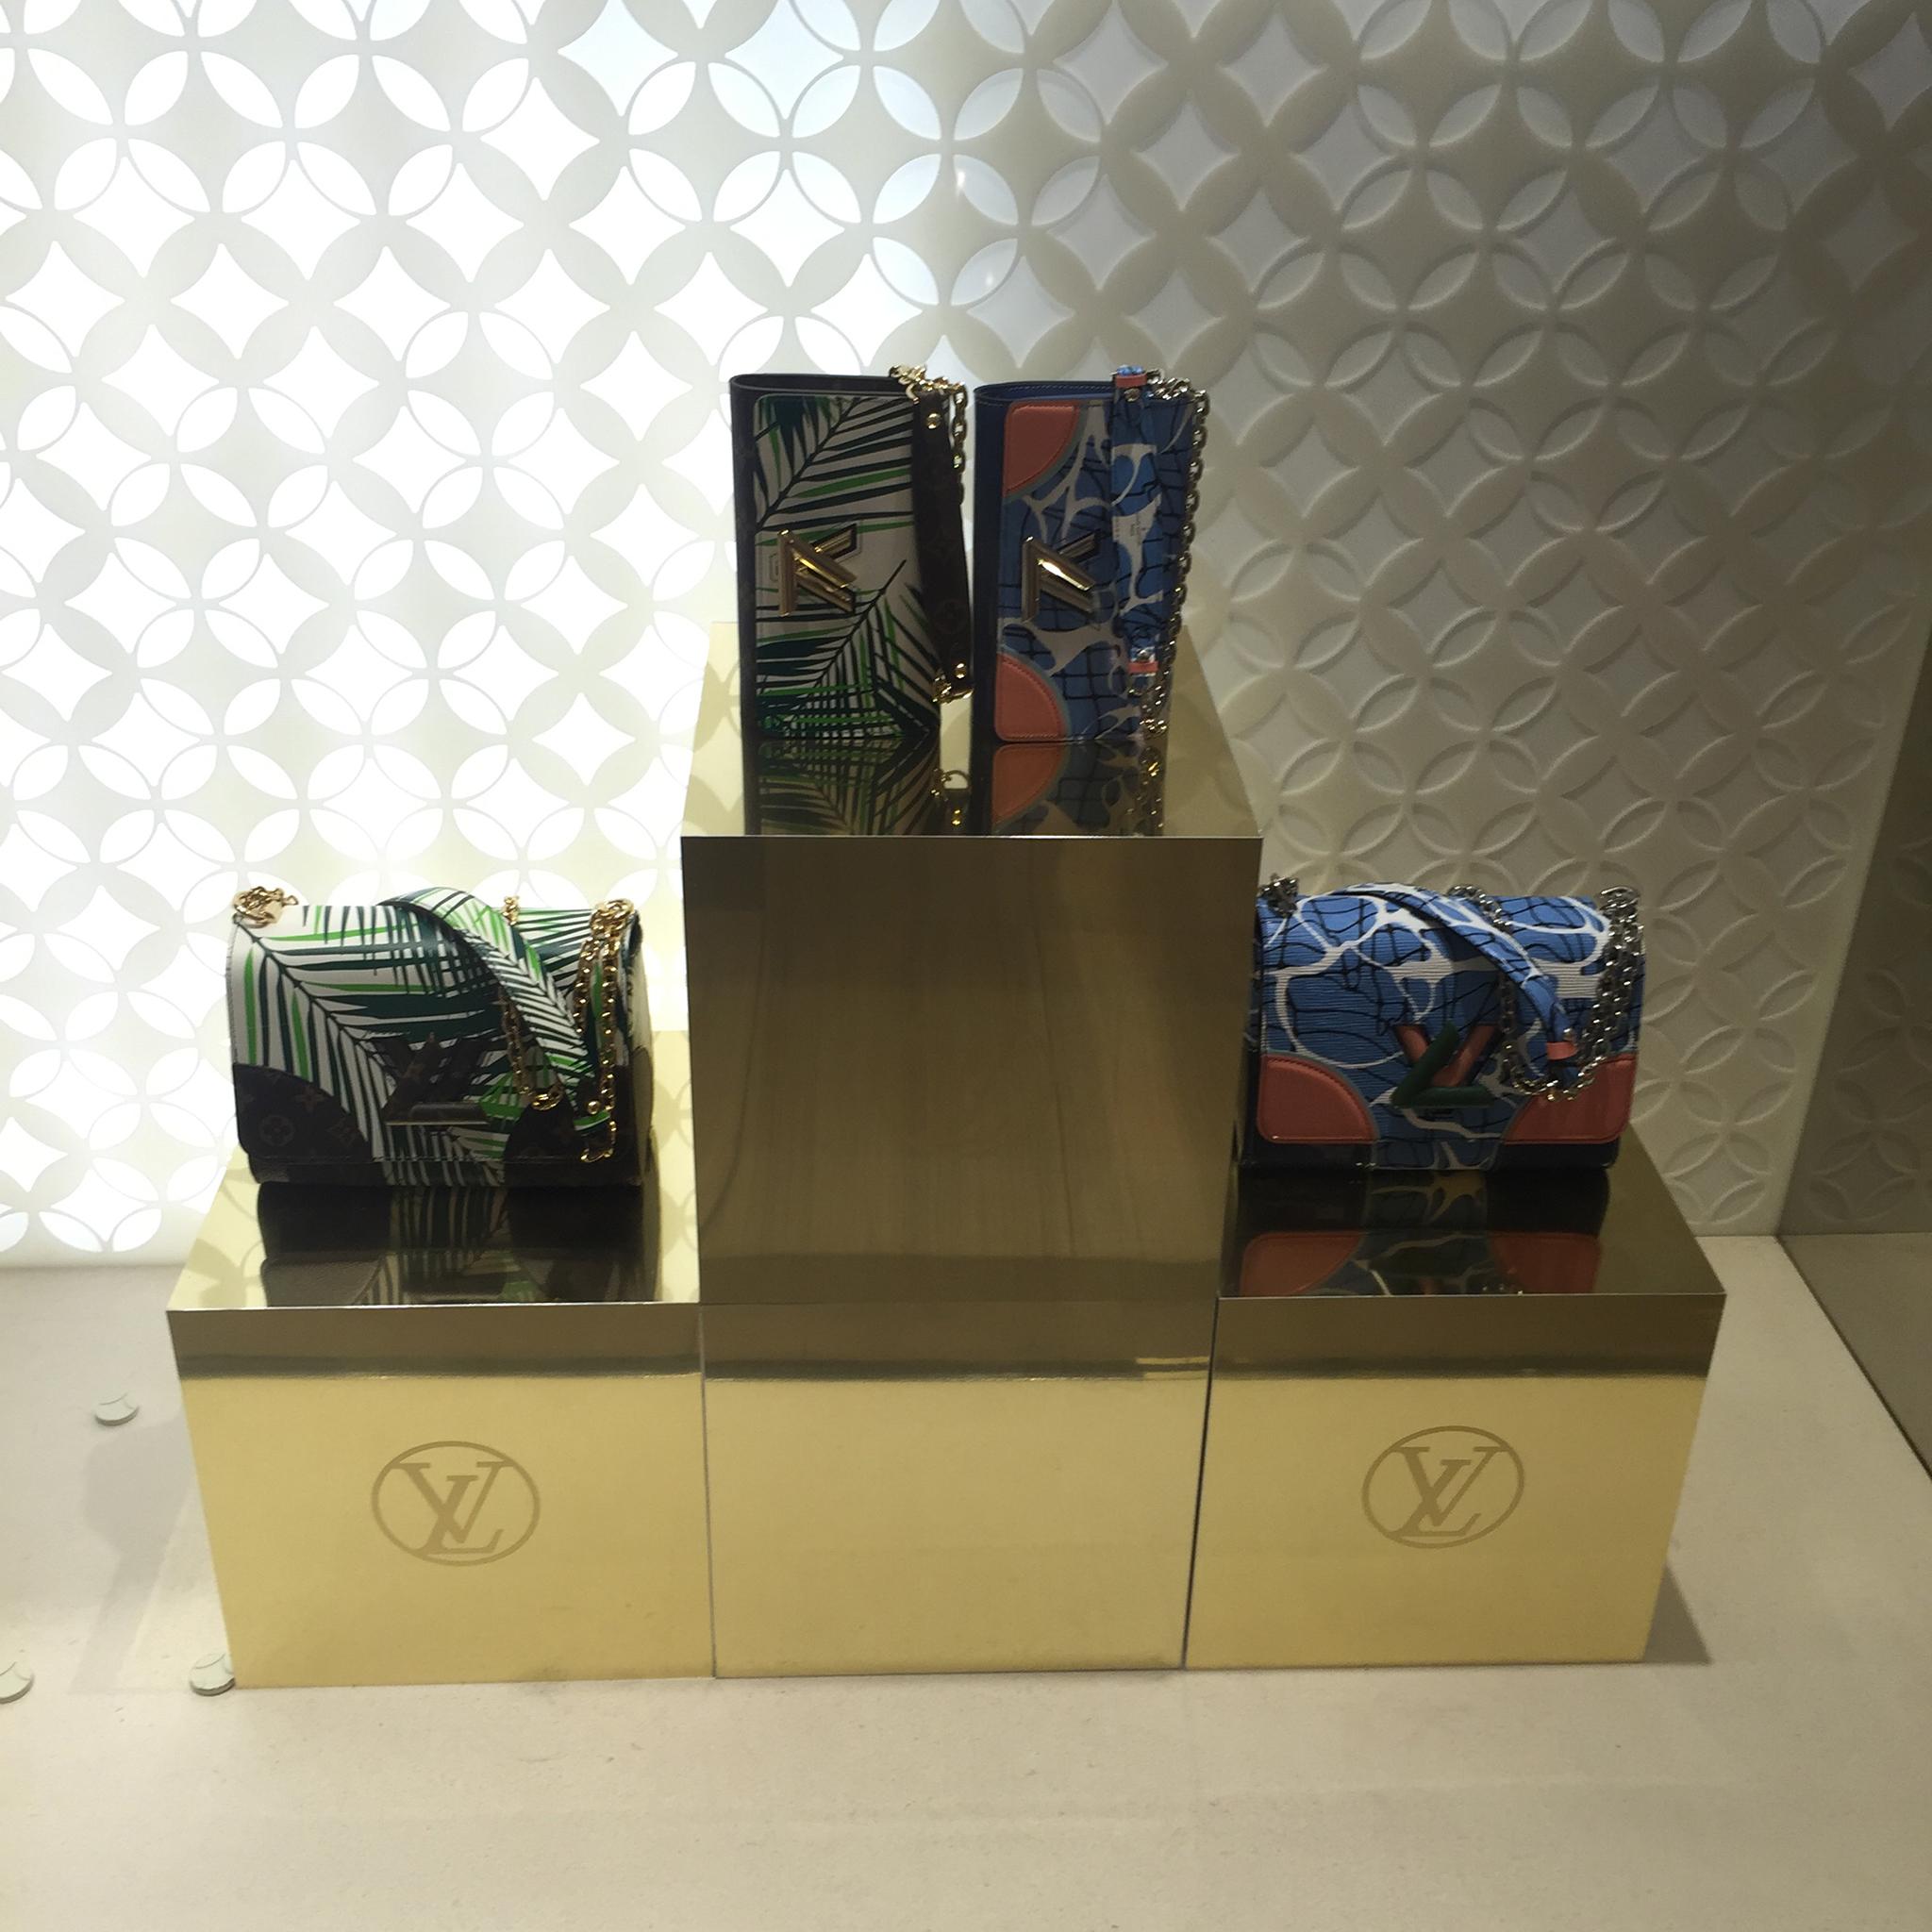 Louis-Vuitton-Saks-5th-Ave-02